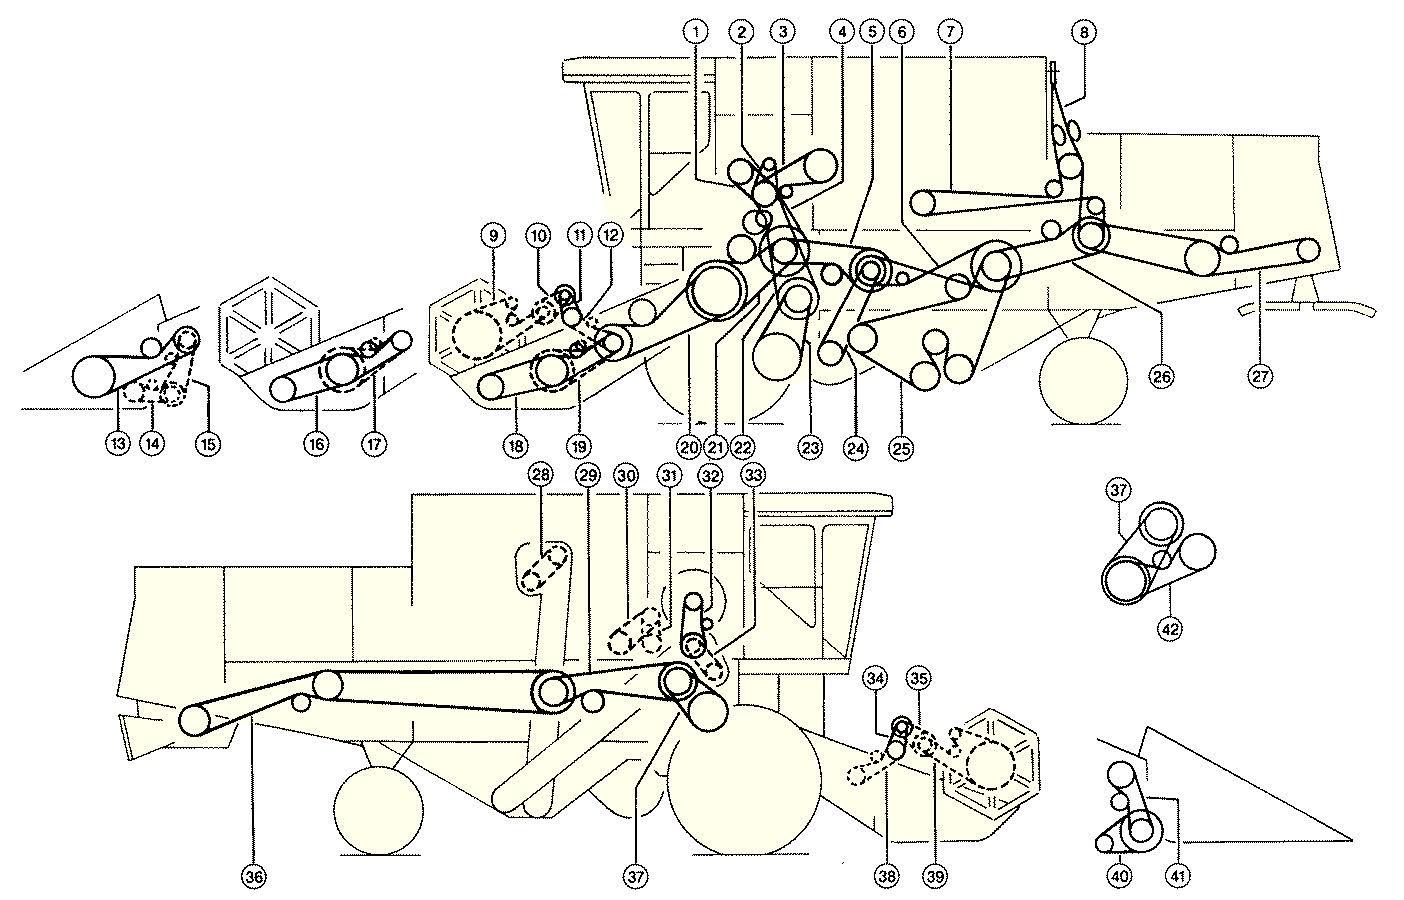 Combine Harvester Schematic Diagram : Diagram of combine harvester images how